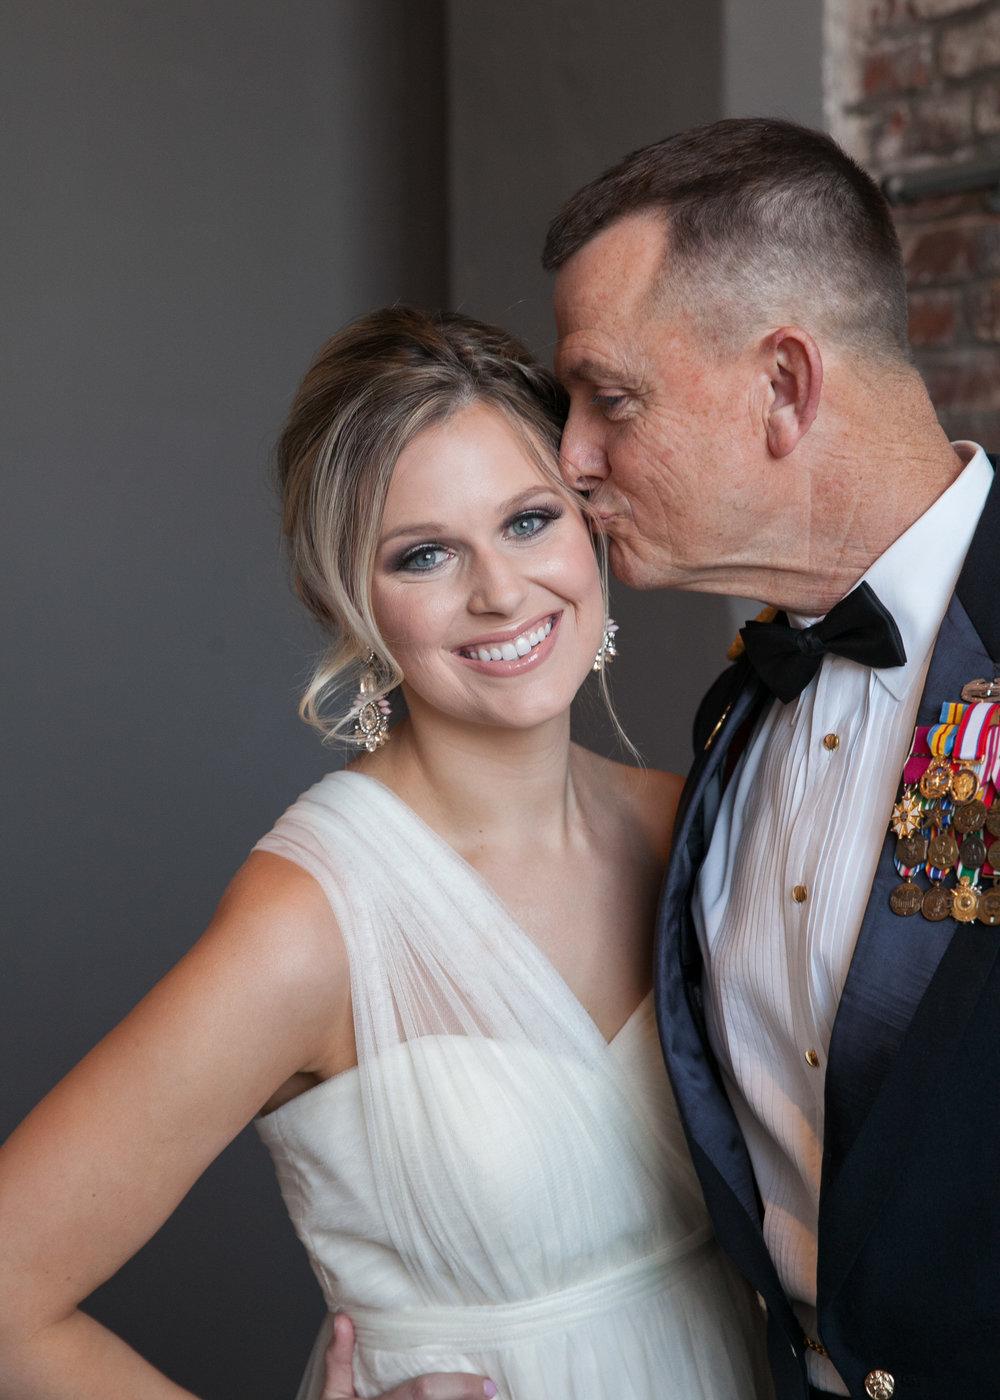 Kansas+City-Small+Wedding_Venue_Elope_Intimate_Ceremony_Memorial+Day_4.jpg